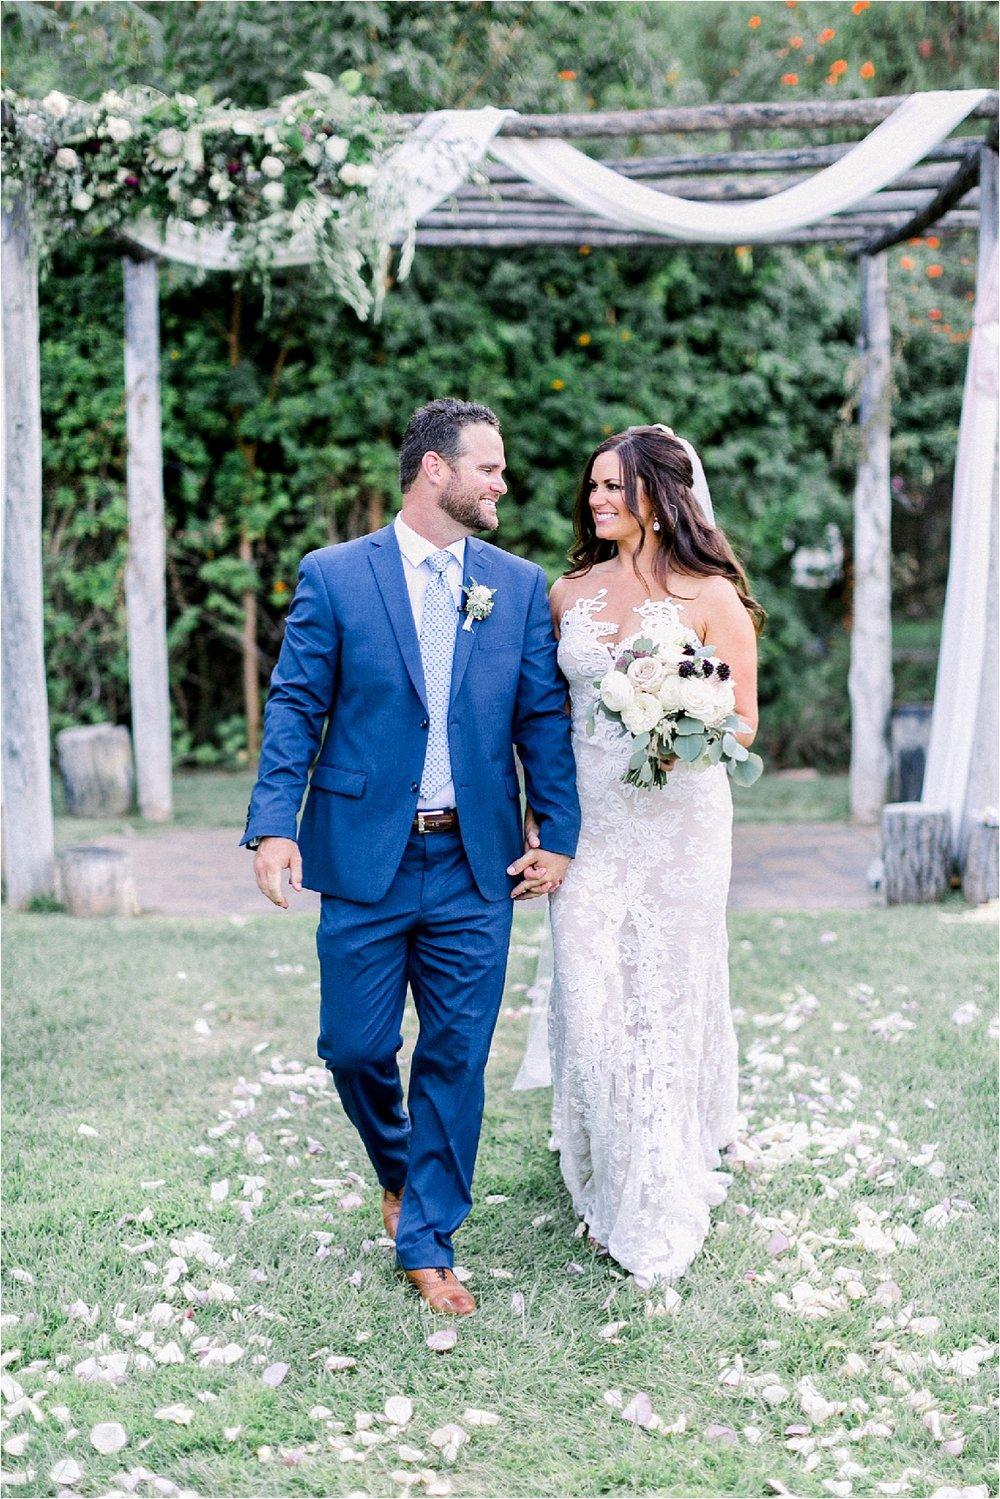 Bandy Canyon Ranch Wedding photos - Petula Pea Photography  13.jpg